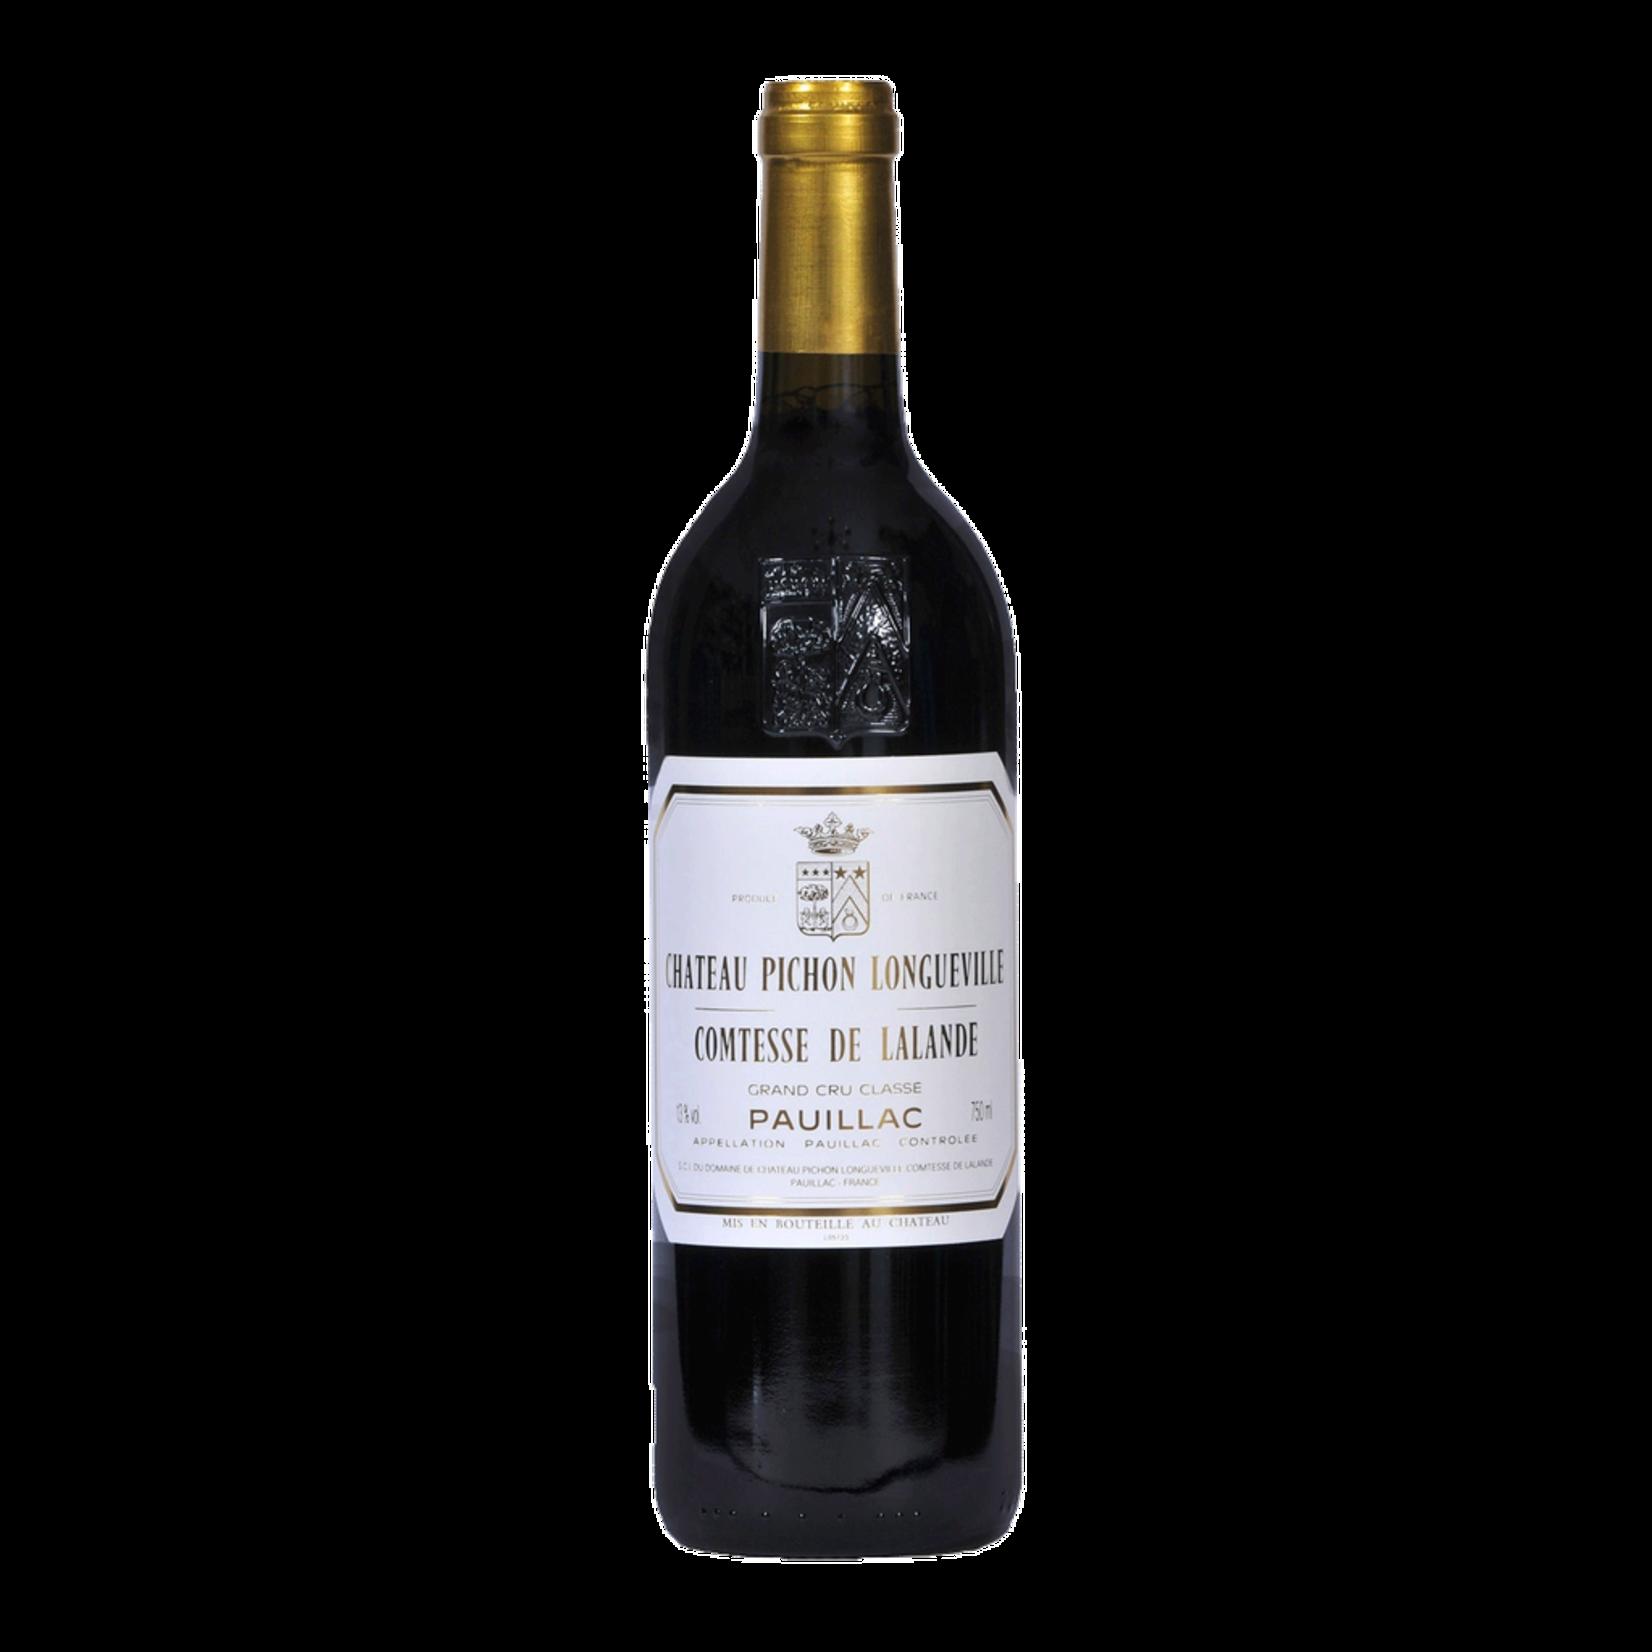 Wine Chateau Pichon Comtesse Lalande 2007